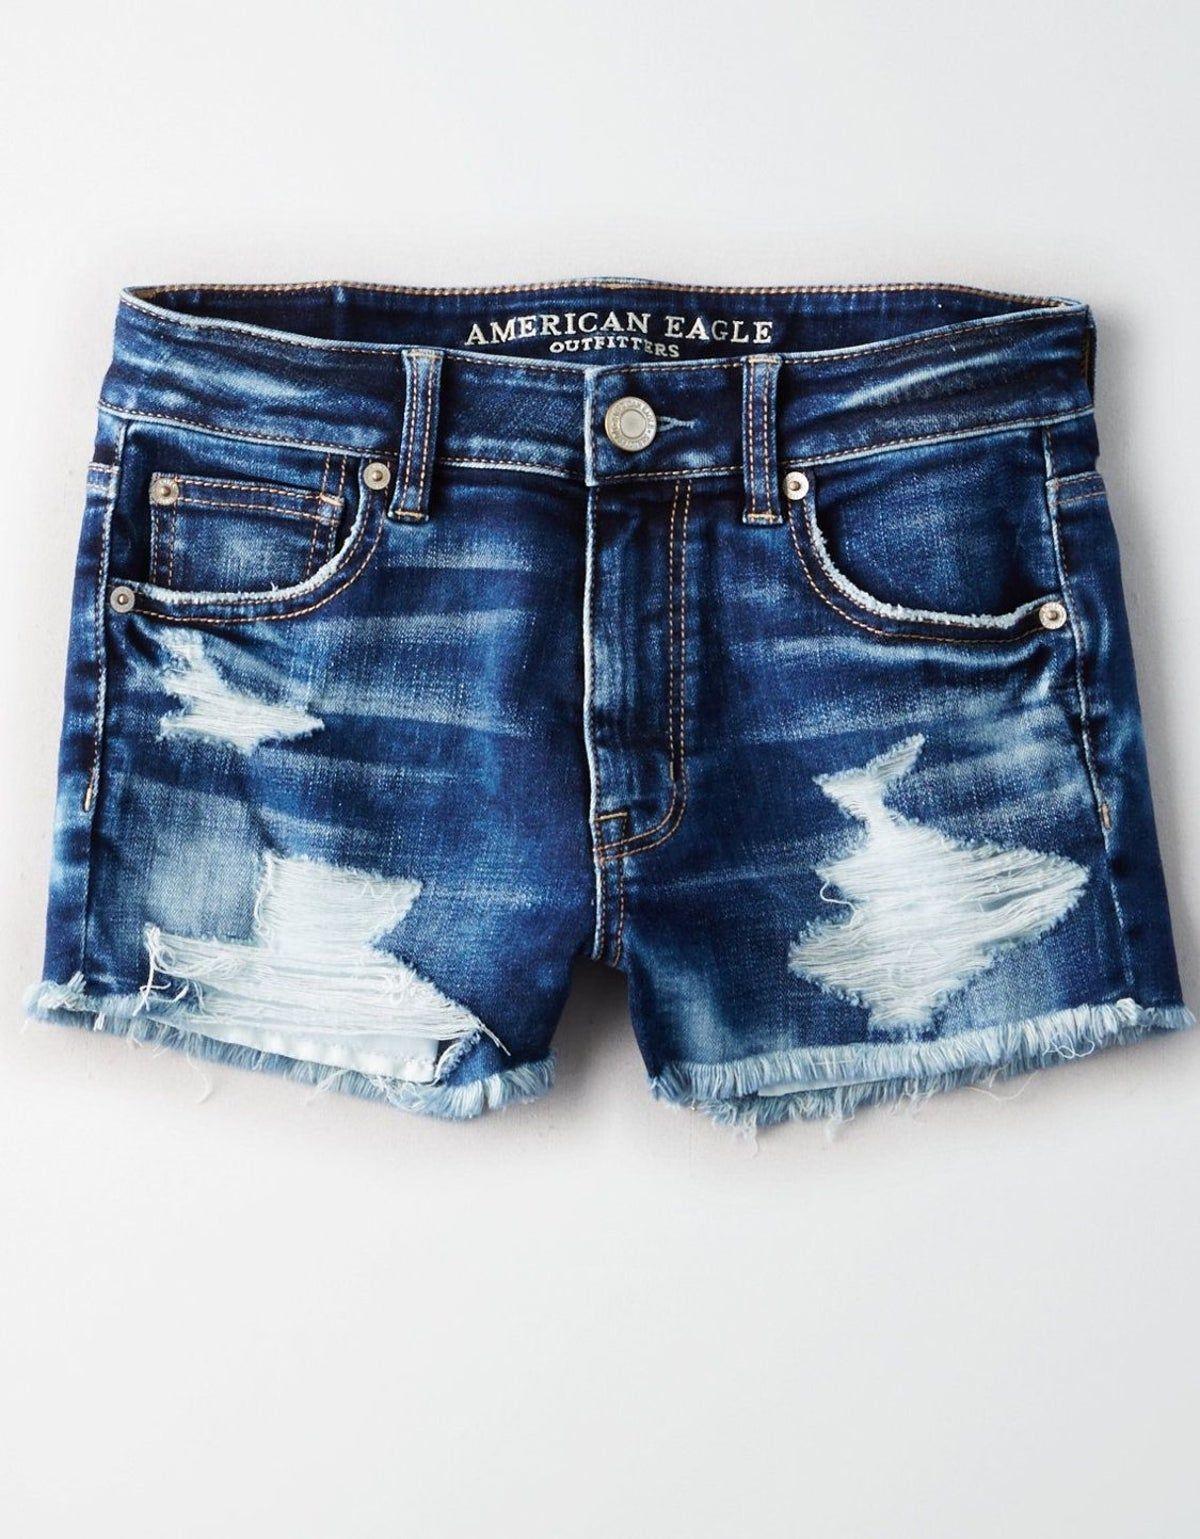 American Eagle Shorts - Eagle Shirt - Ideas of Eagle Shirt #Eagle Shirt -   American Eagle Shorts